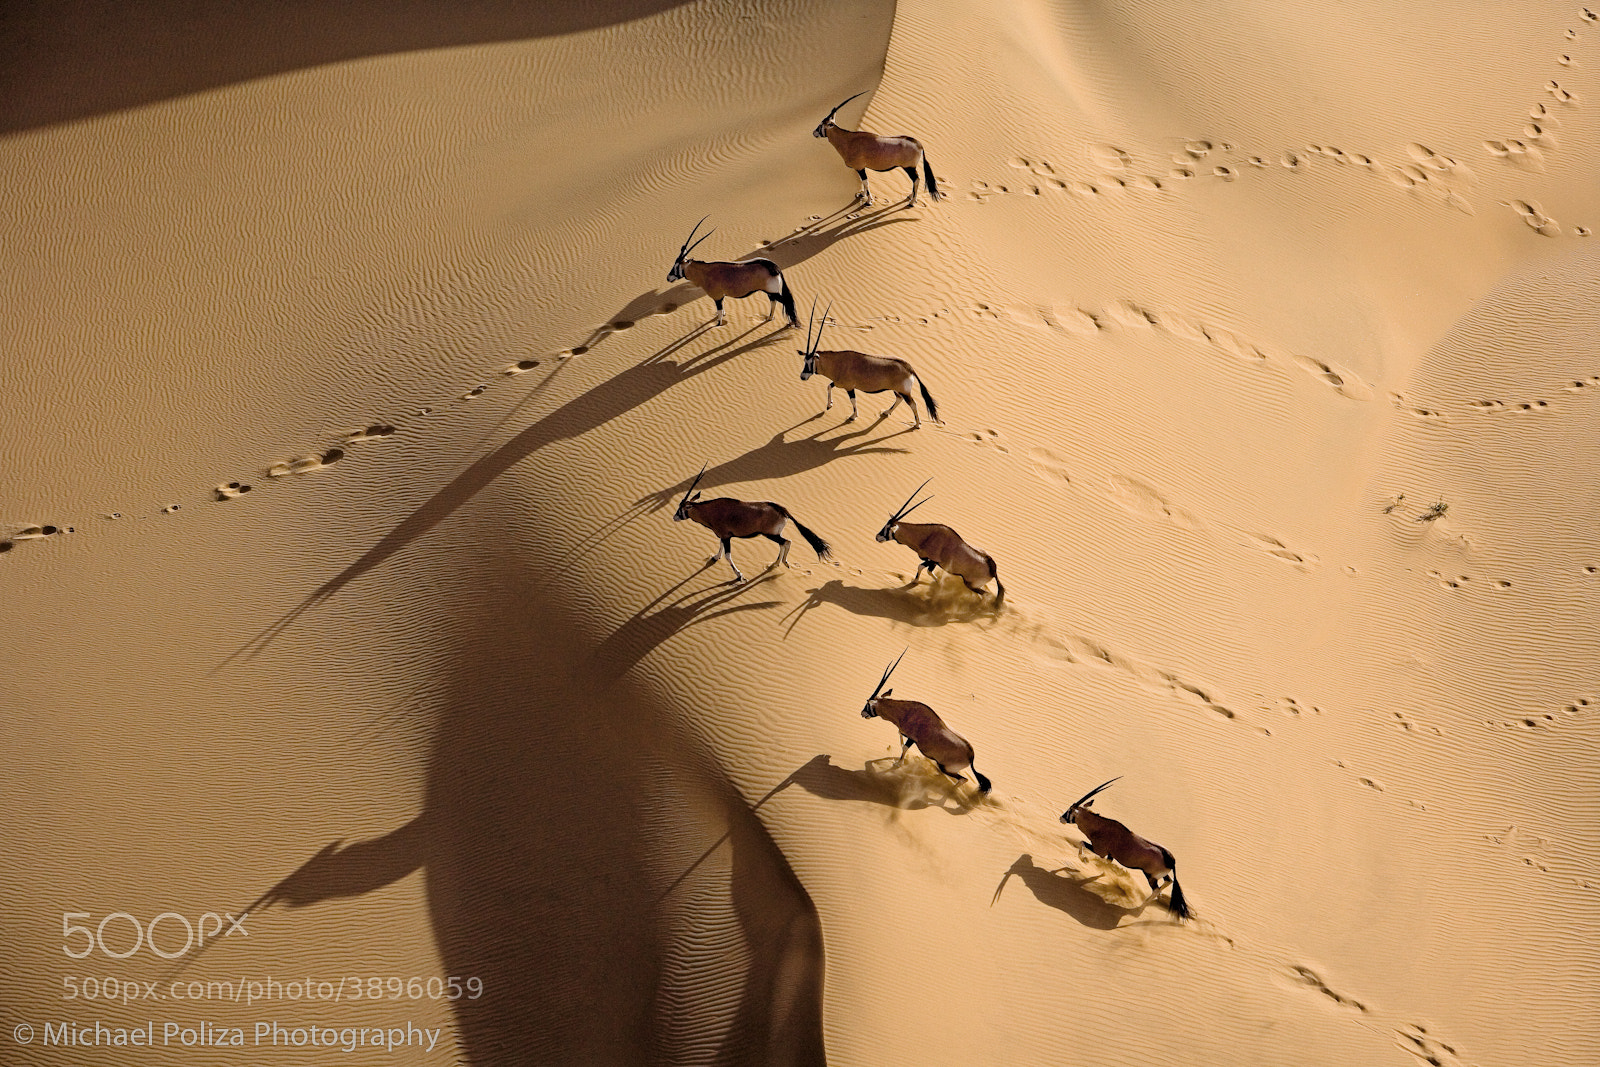 Photograph Gemsbok Herd by Michael Poliza on 500px